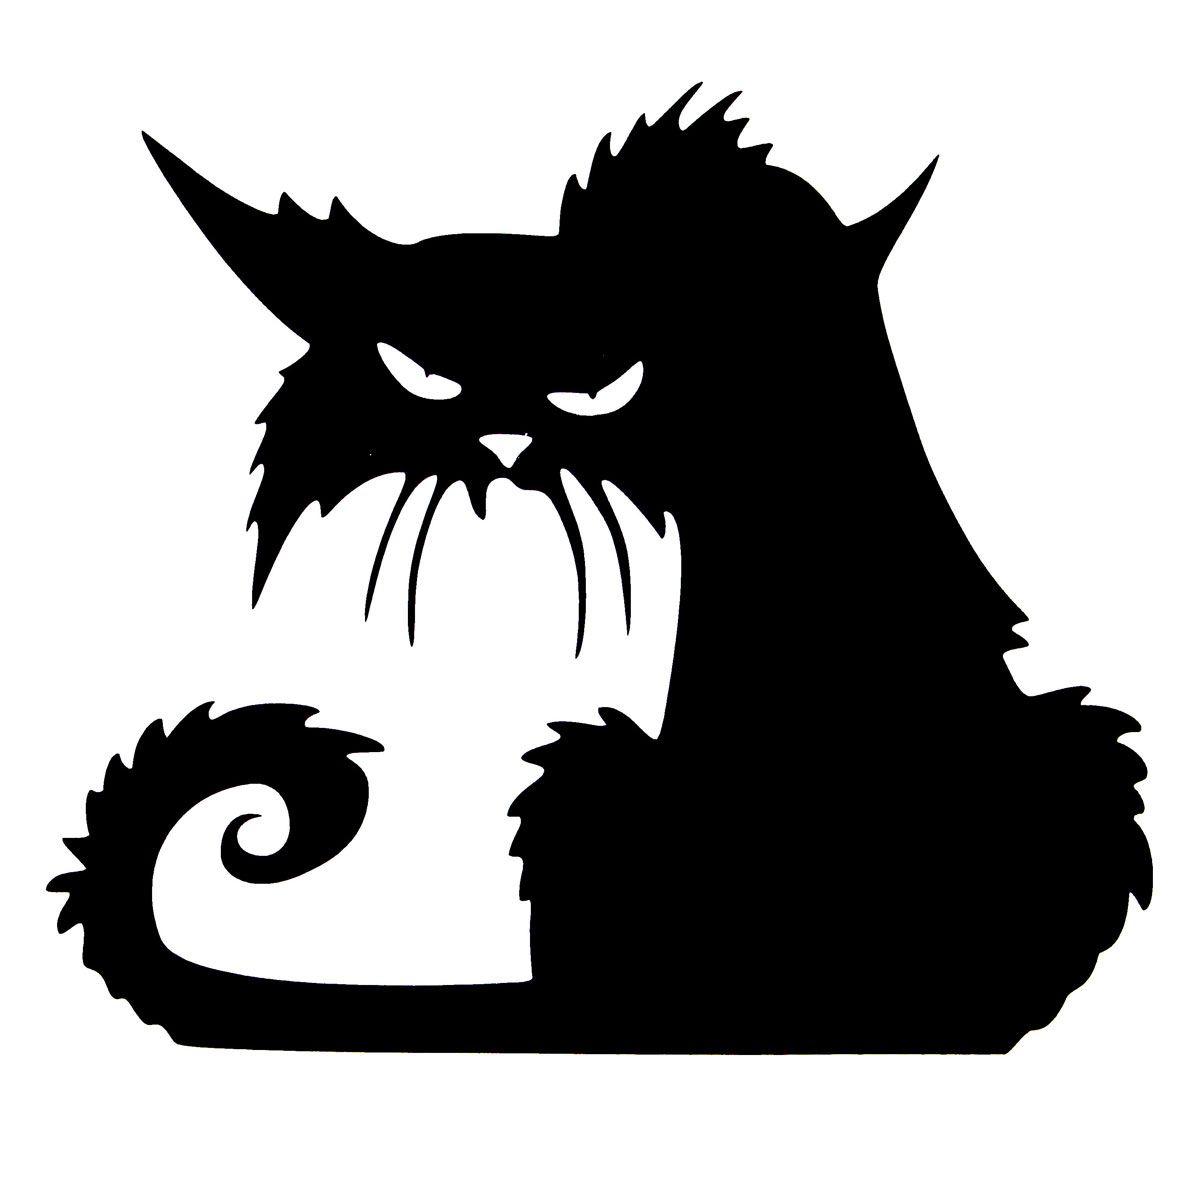 halloween scary black cat glass sticker halloween decor scary halloween scary black cat glass sticker halloween decor